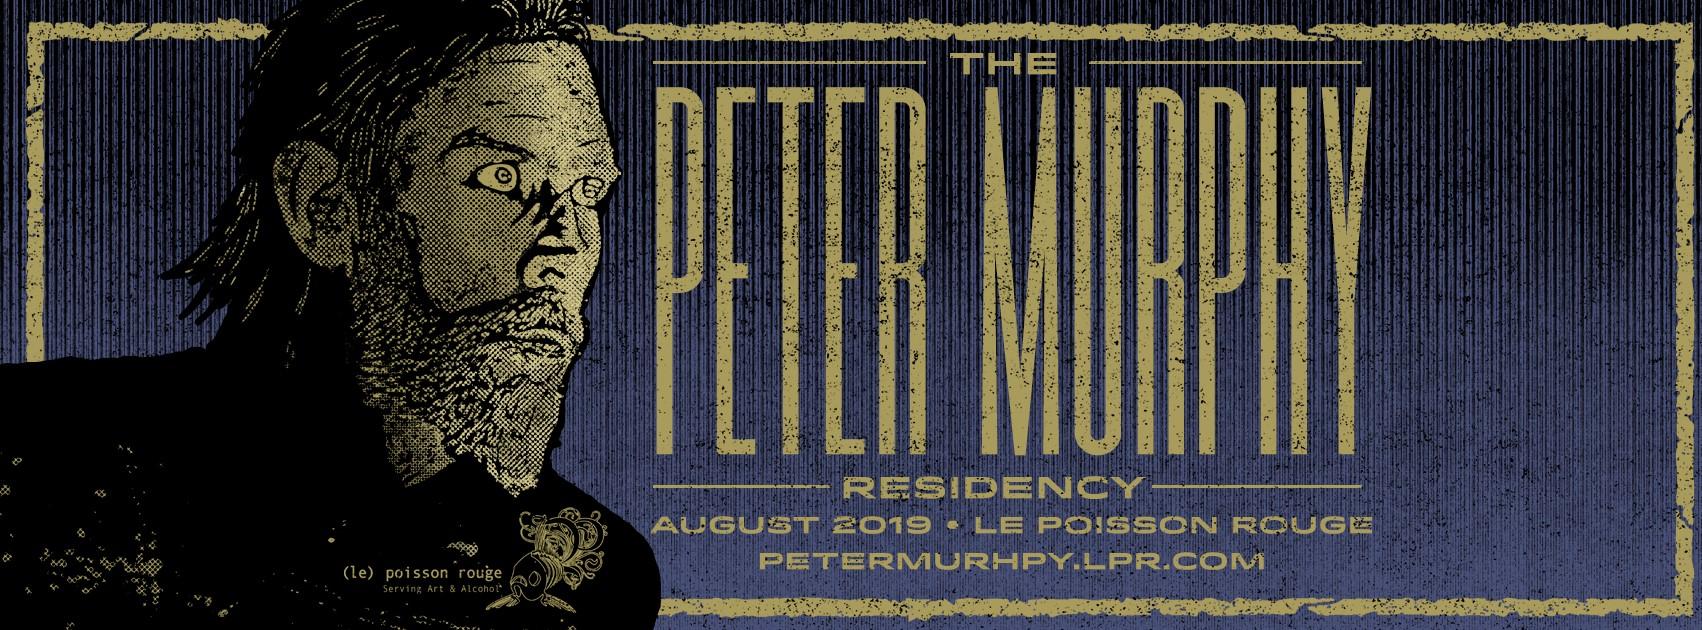 Peter murphy pic.jpg